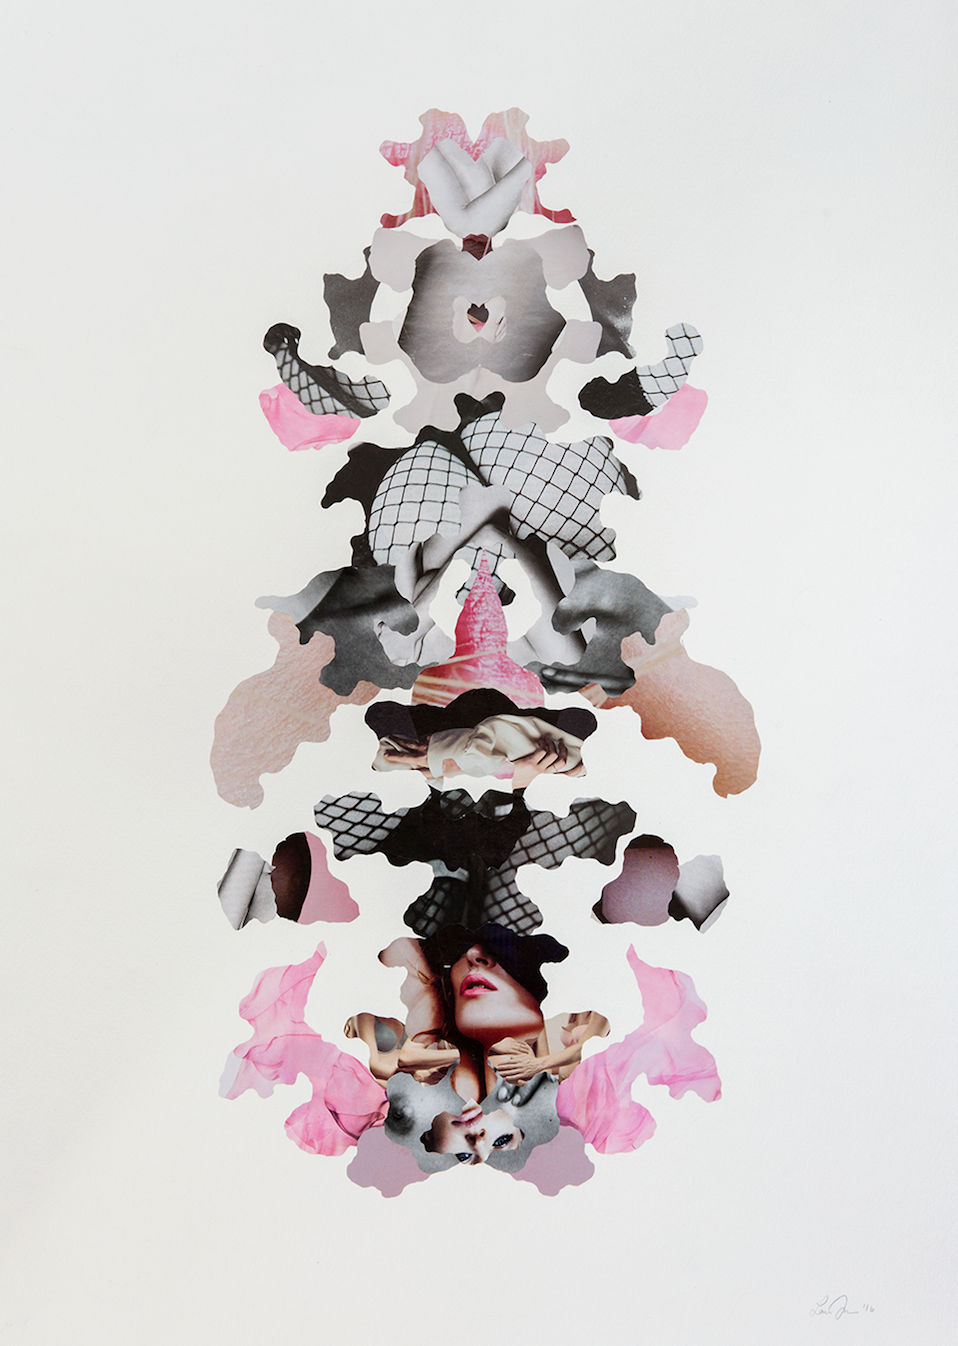 Introducing: Collage Artist Lauren Munns